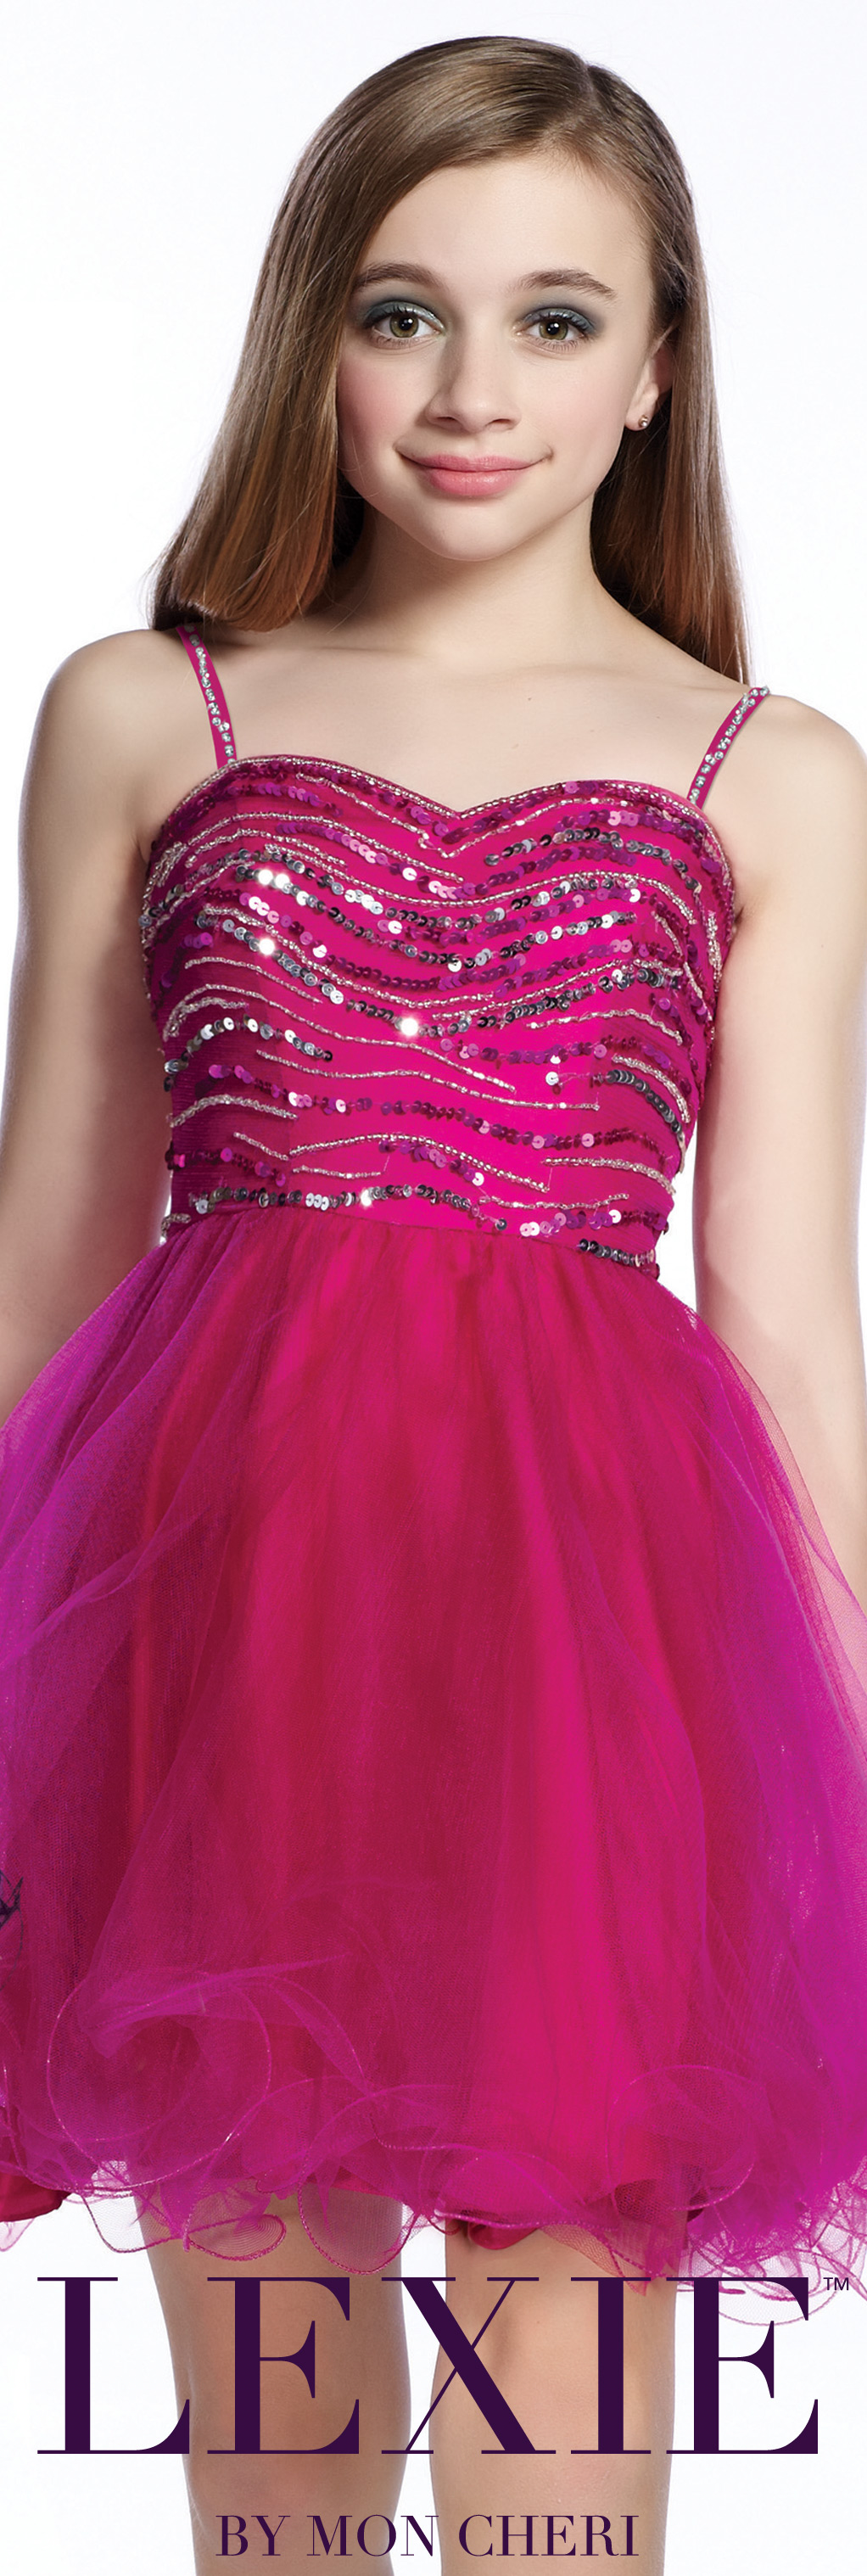 Lexie by Mon Cheri - Sheath 8th Grade Formal Dress - Style No ...